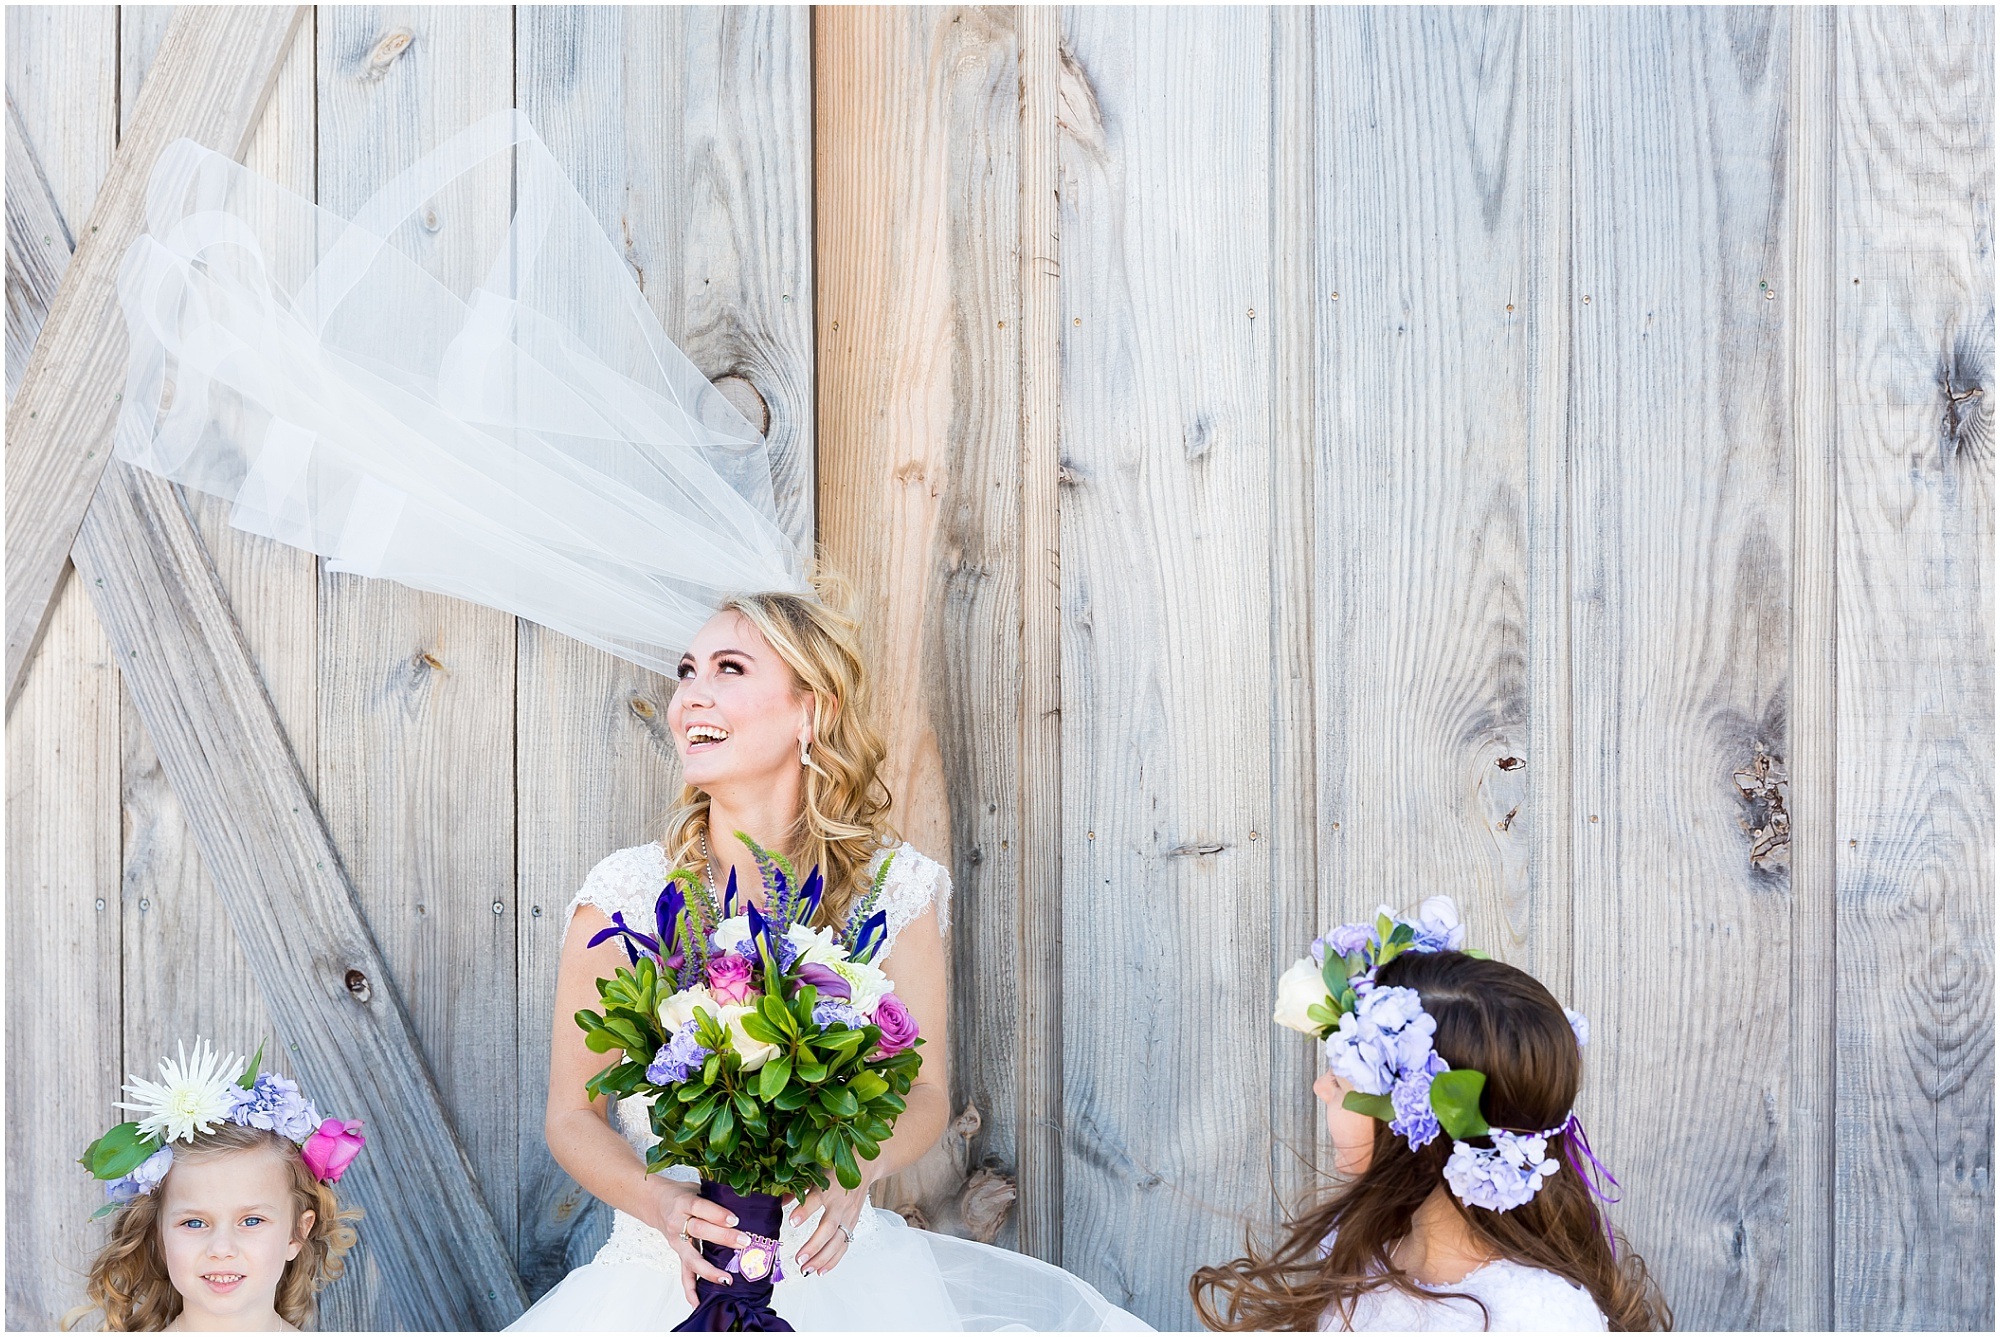 Disney-Inspired-Wedding-Central-Texas_0018.jpg